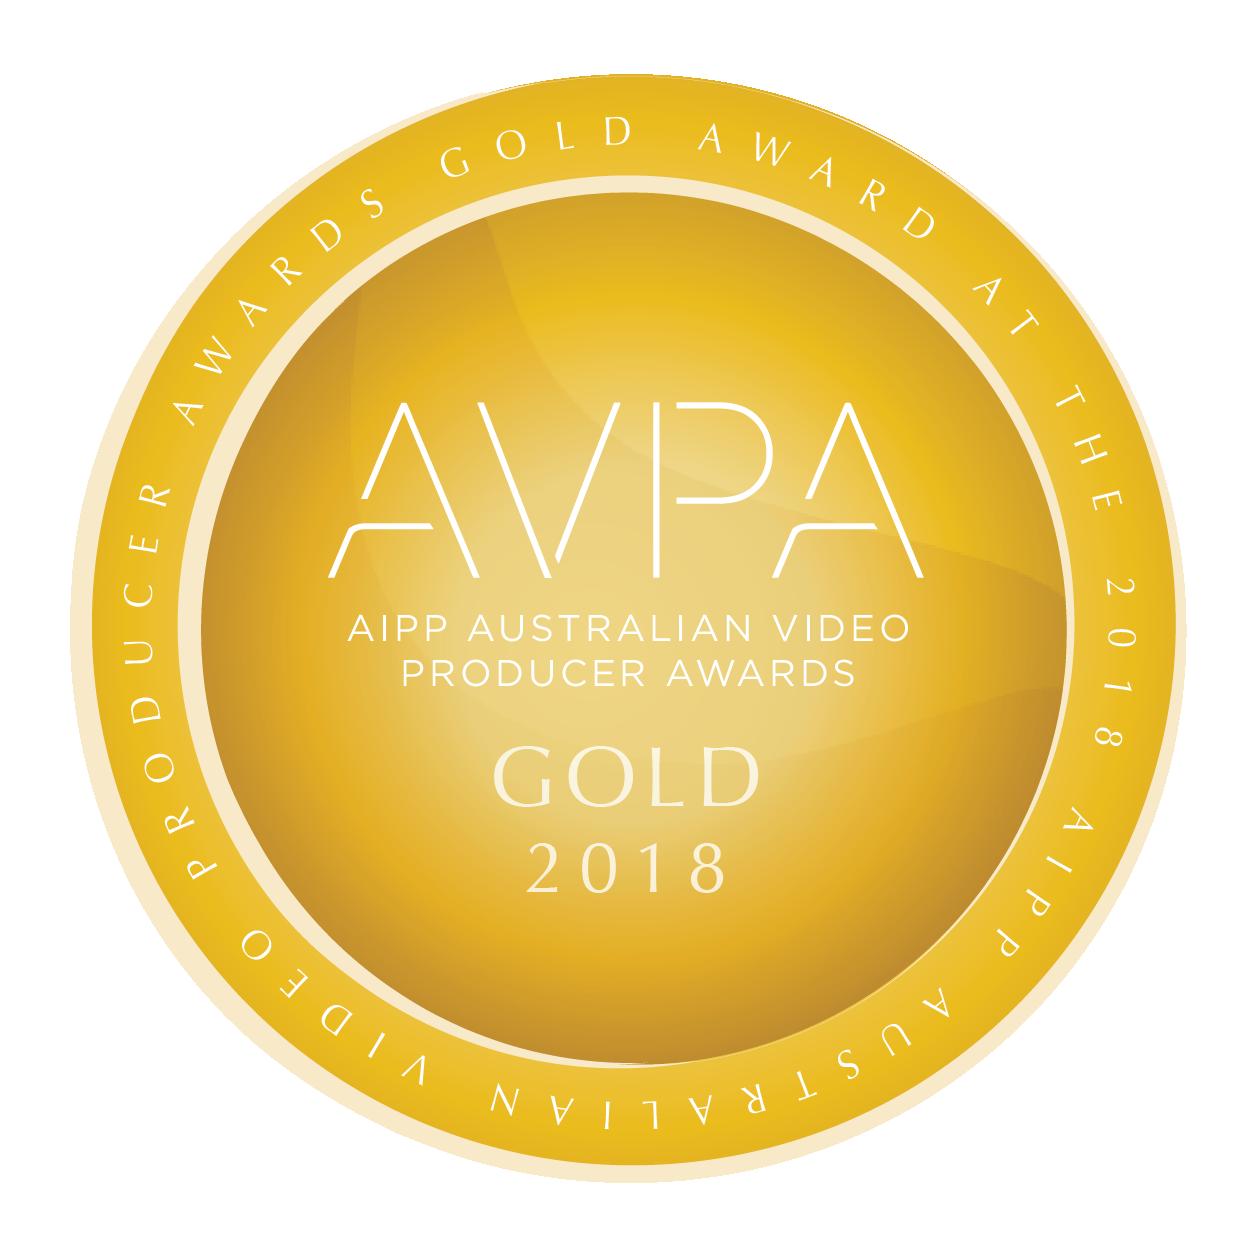 2018 Gold Award Winner - Australian Video Producer Awards